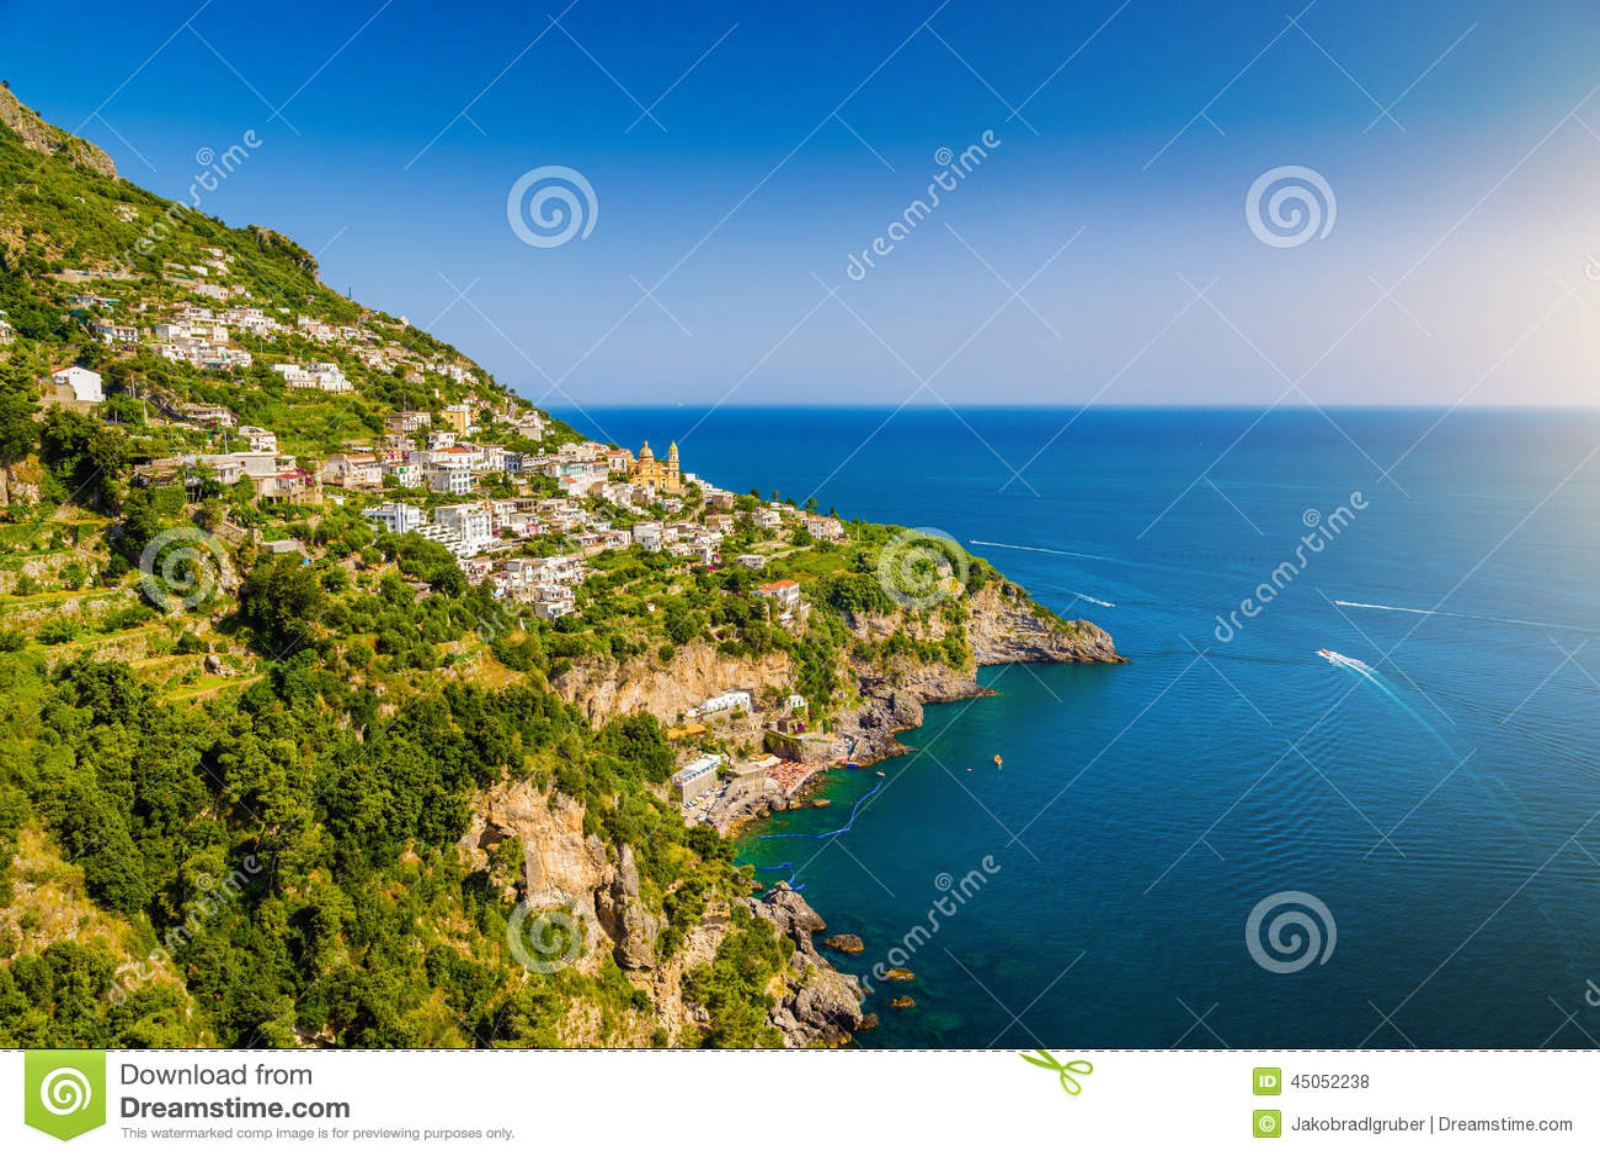 Amalfi Coast with Gulf of Salerno in beautiful evening light, Campania, Italy